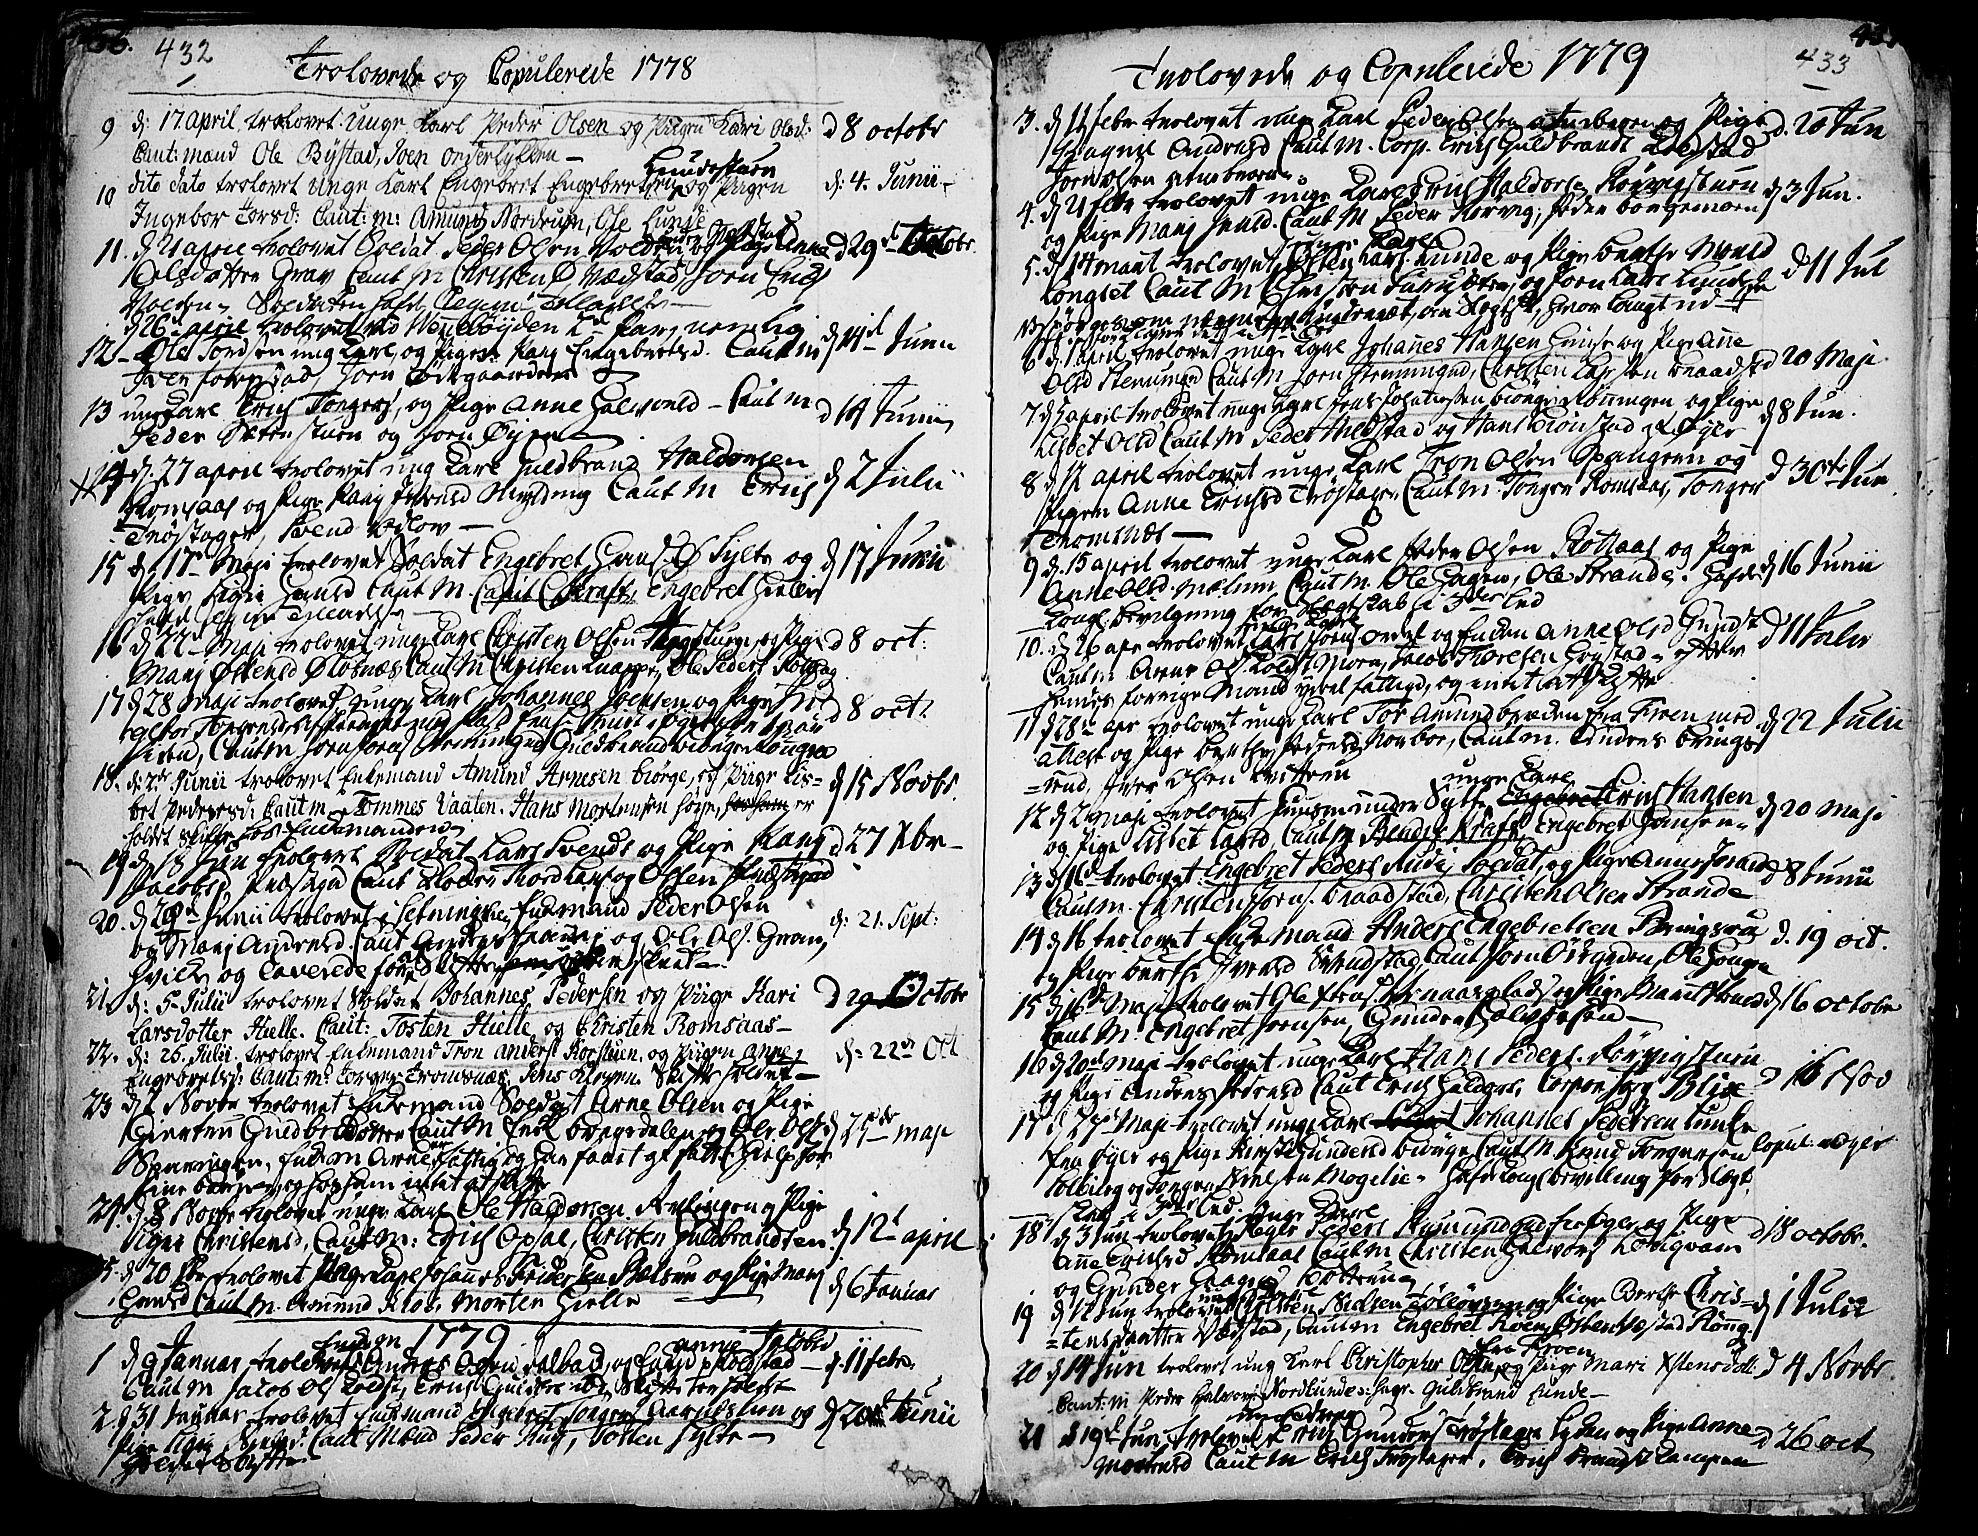 SAH, Ringebu prestekontor, Ministerialbok nr. 2, 1734-1780, s. 432-433